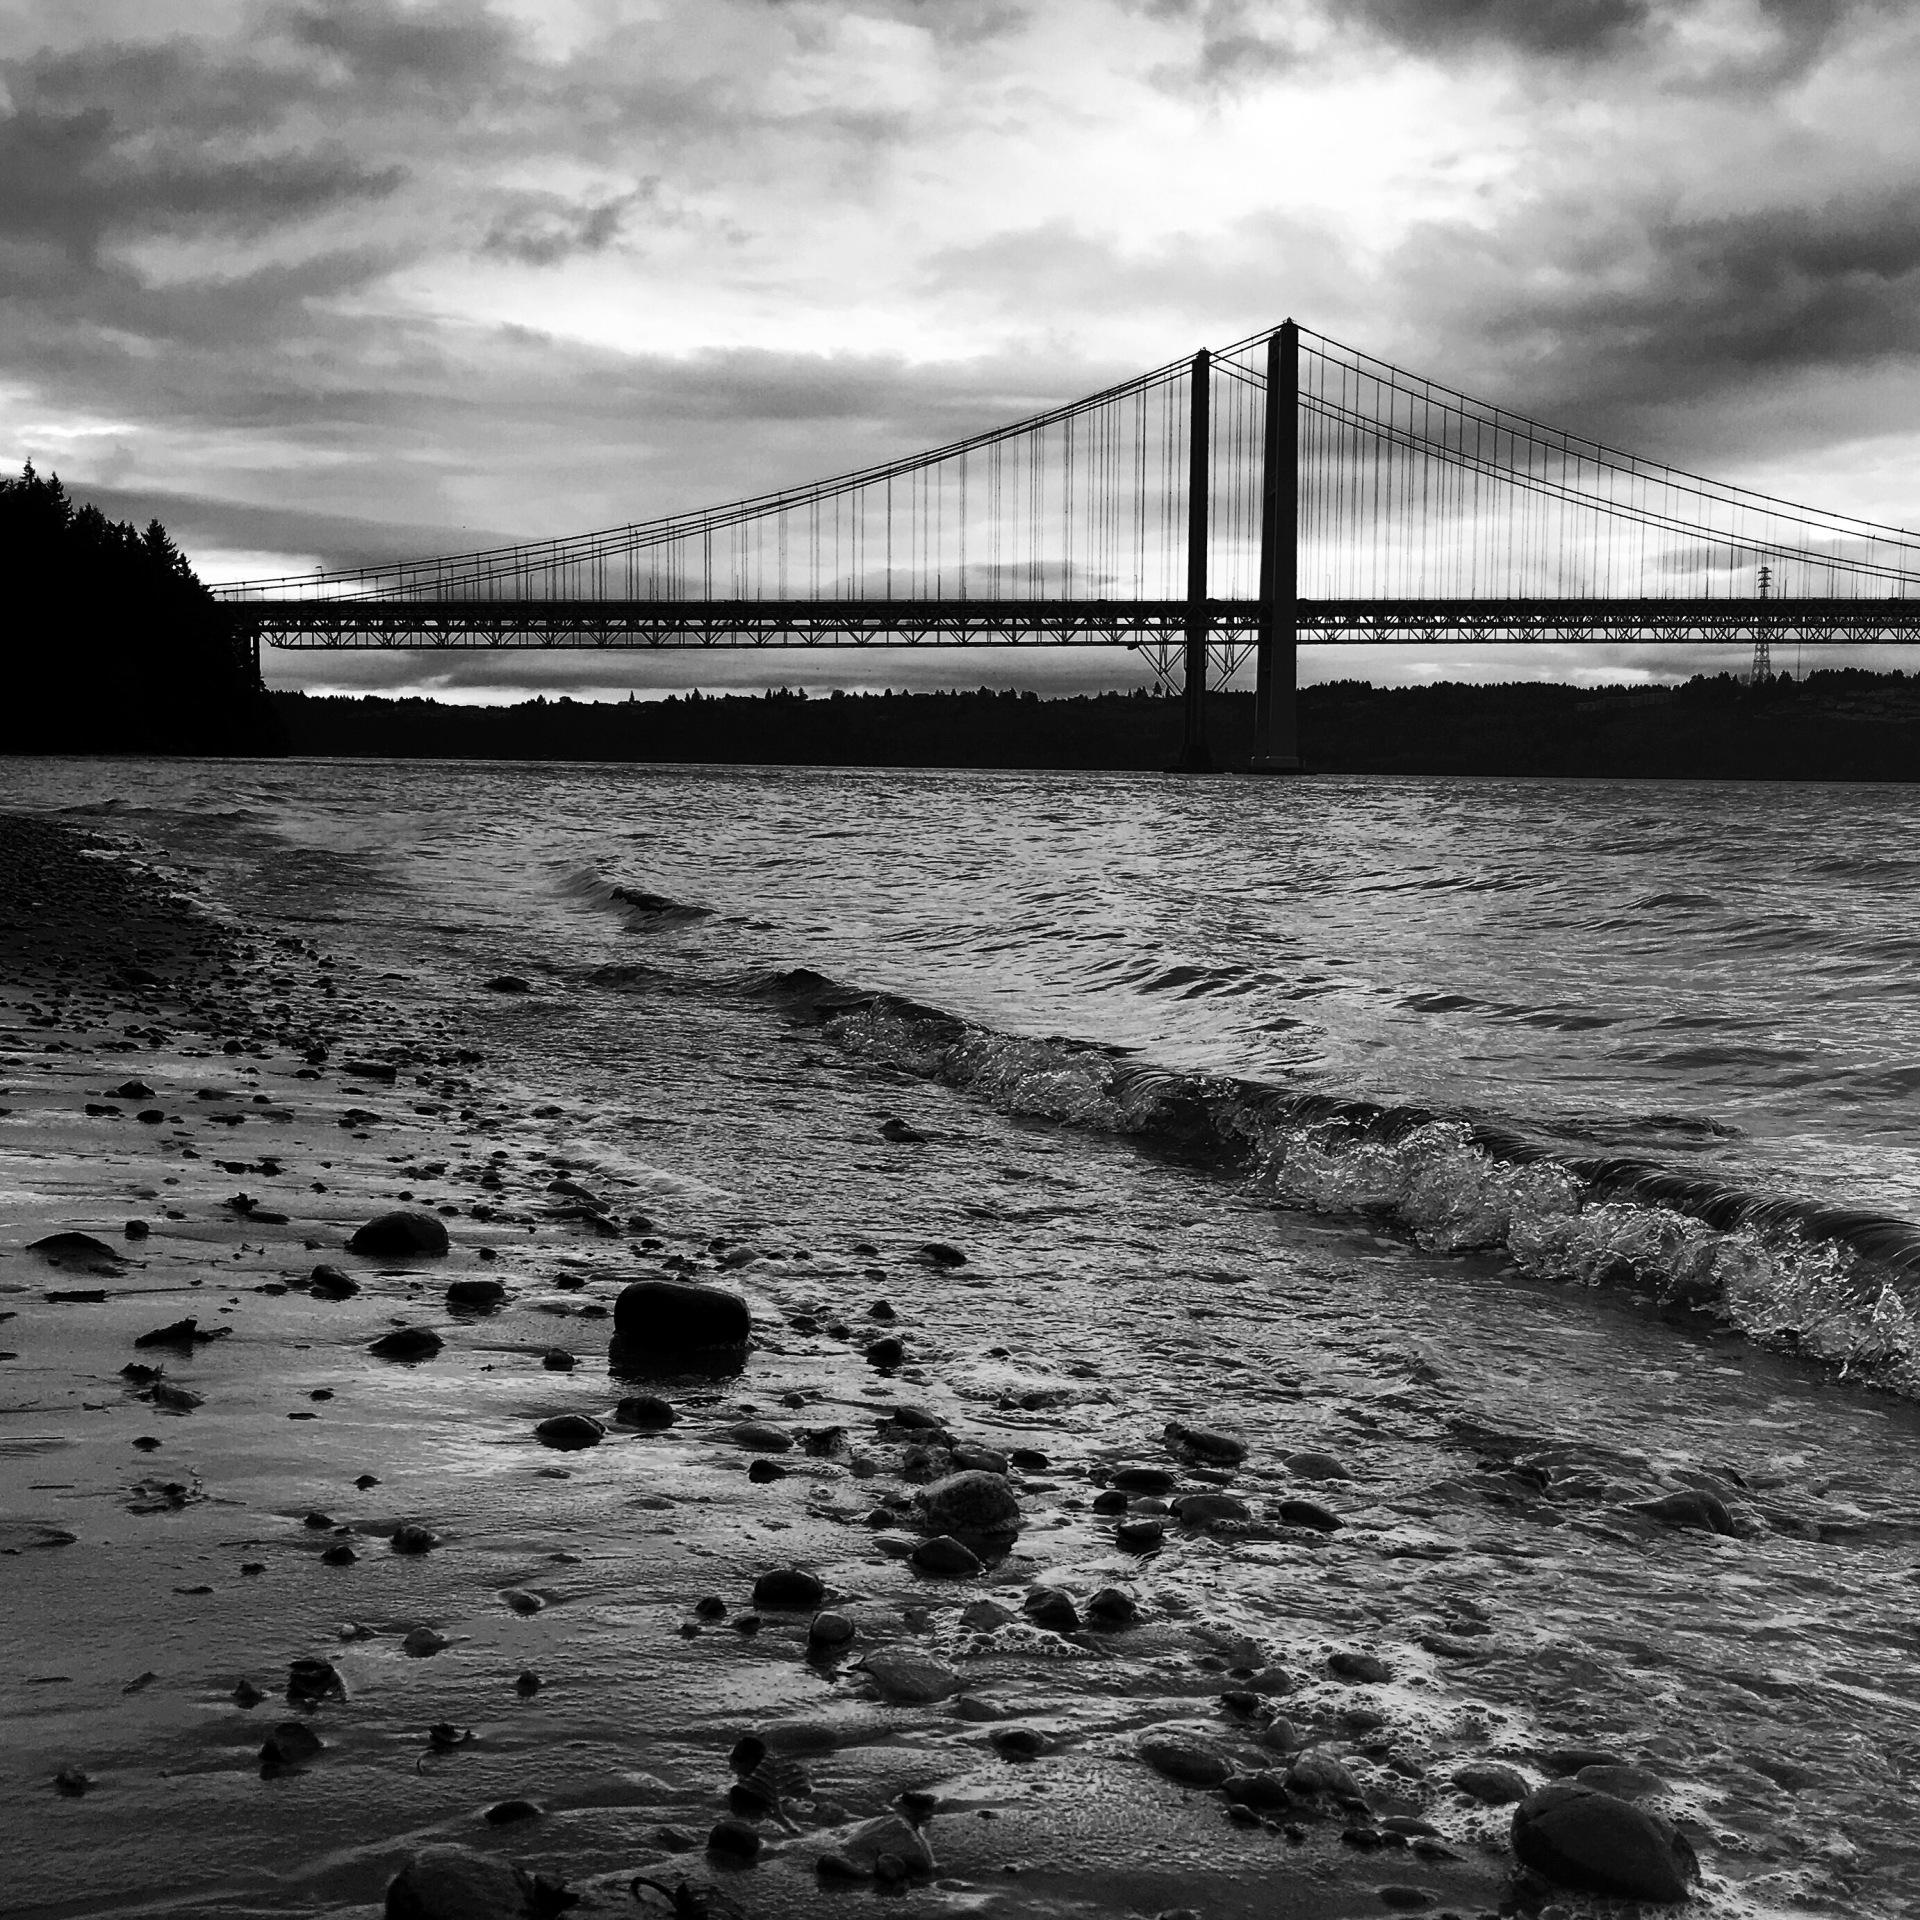 THE NARROWS BRIDGES